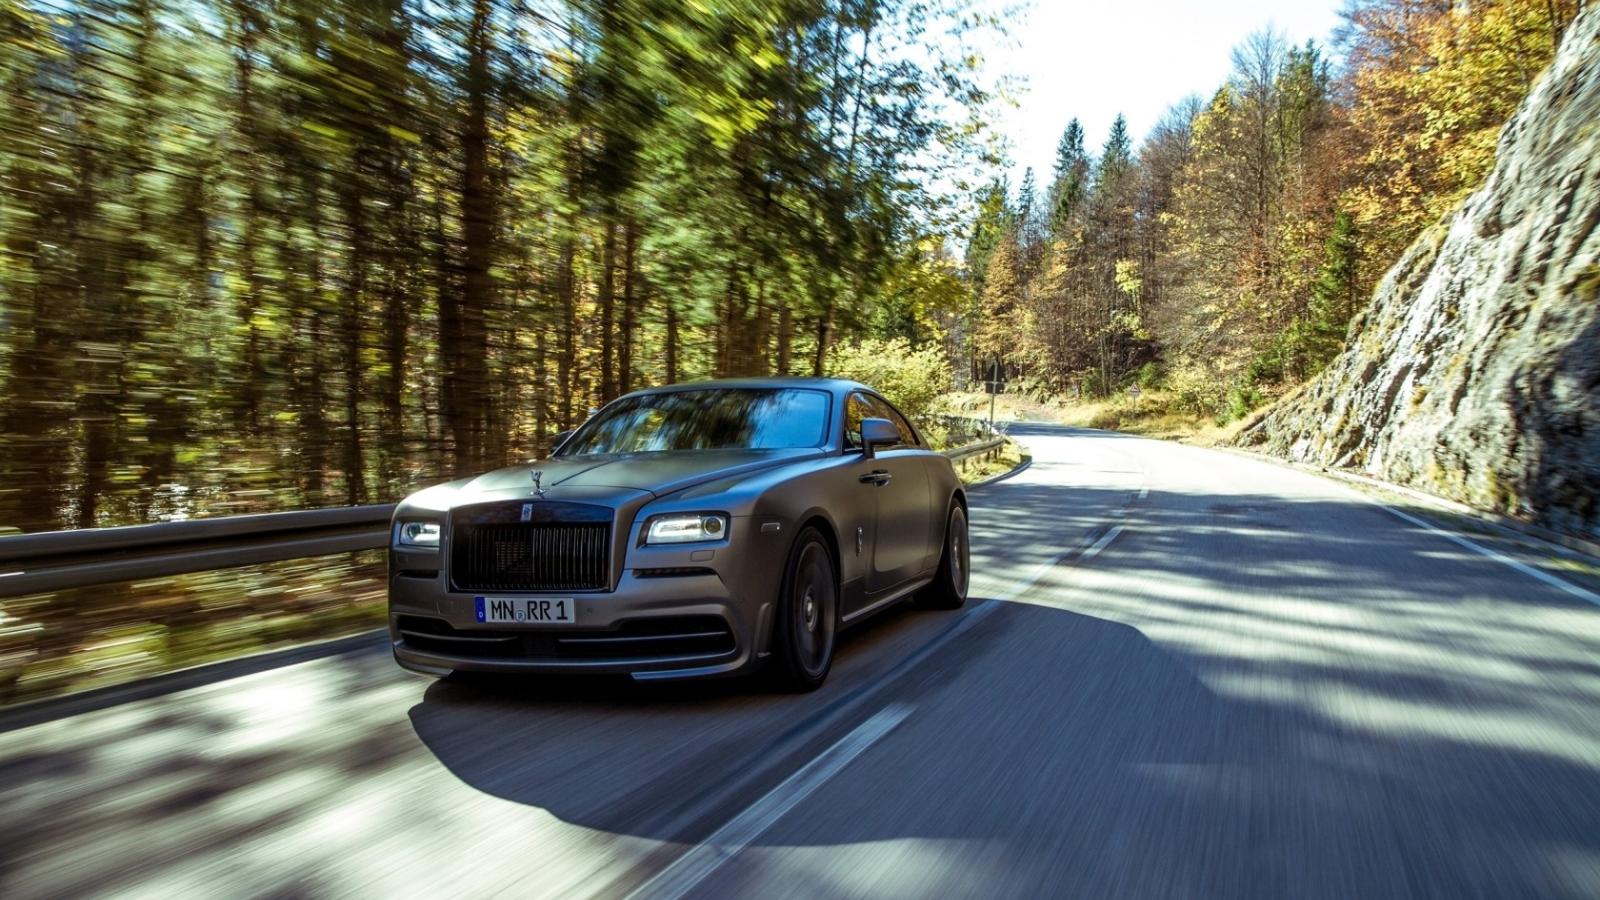 Hd Wallpaper From Samsung J2 Rolls Royce: Rolls Royce, Wraith, Spofec, Full HD Wallpaper